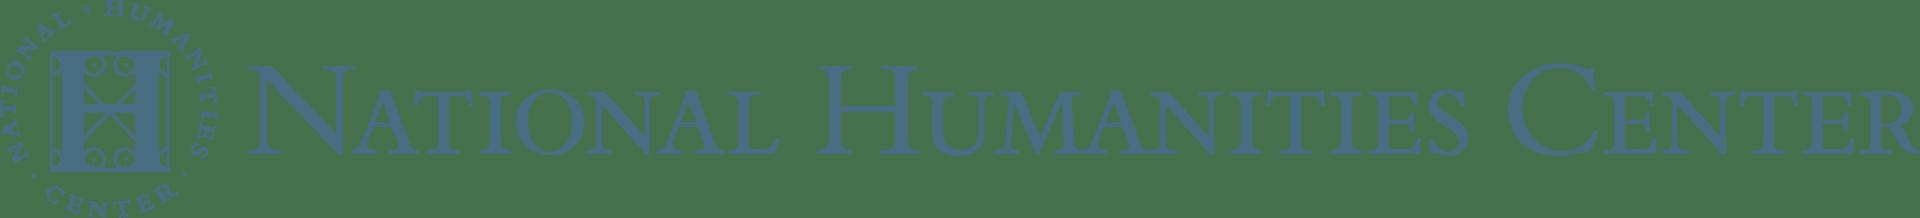 National Humanities Center Geiss Hsu Foundation Fellowship